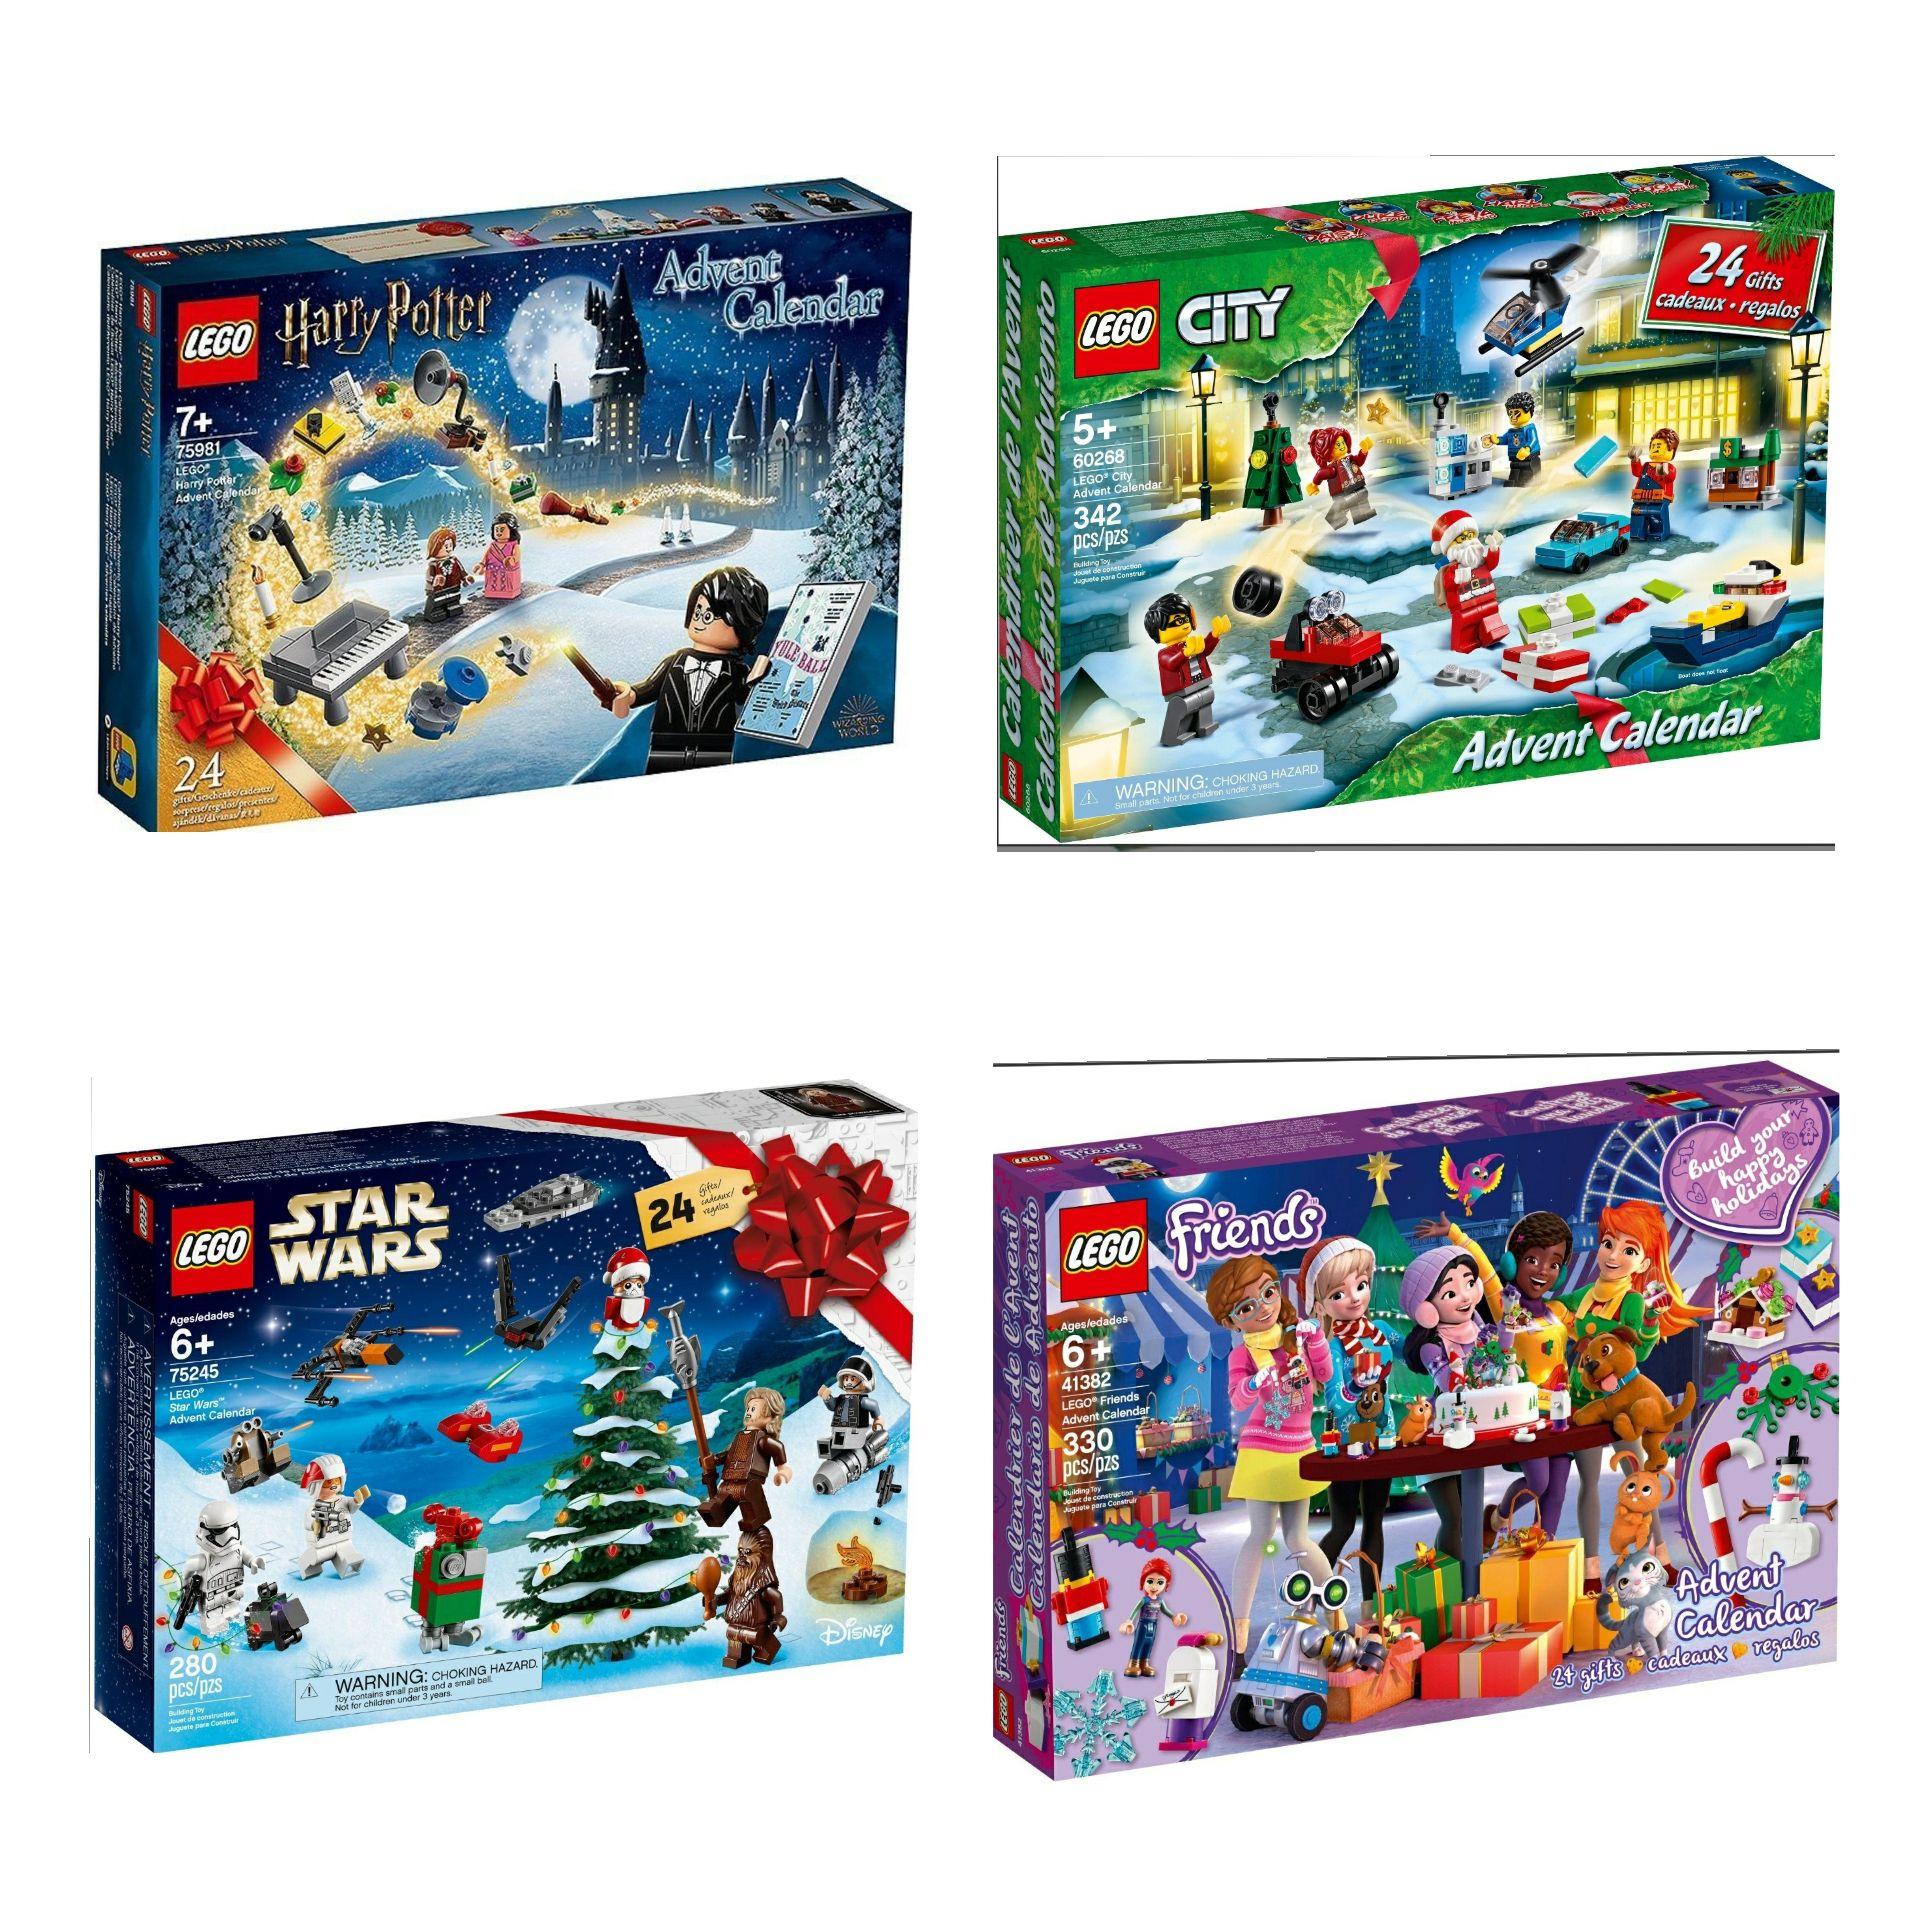 LEGO ADVENTCALENDER diverse (zie tekst)